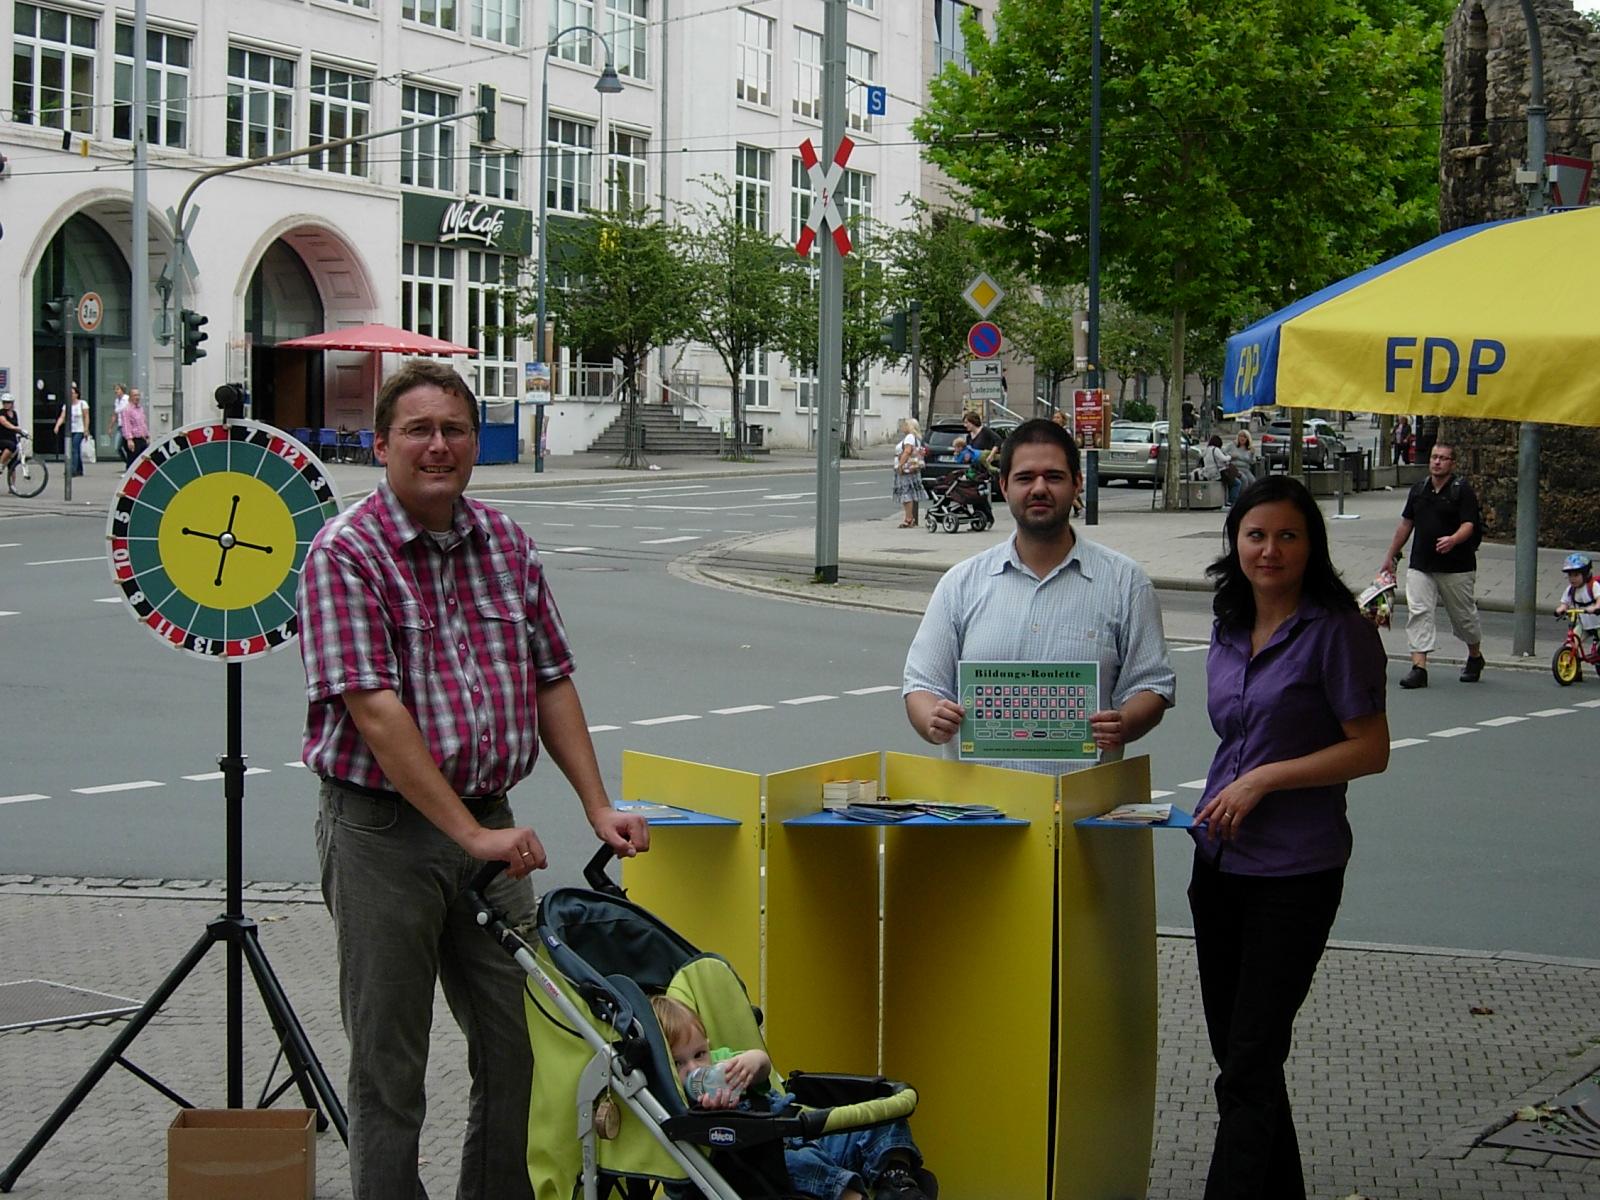 FDP Jena mit Infostand